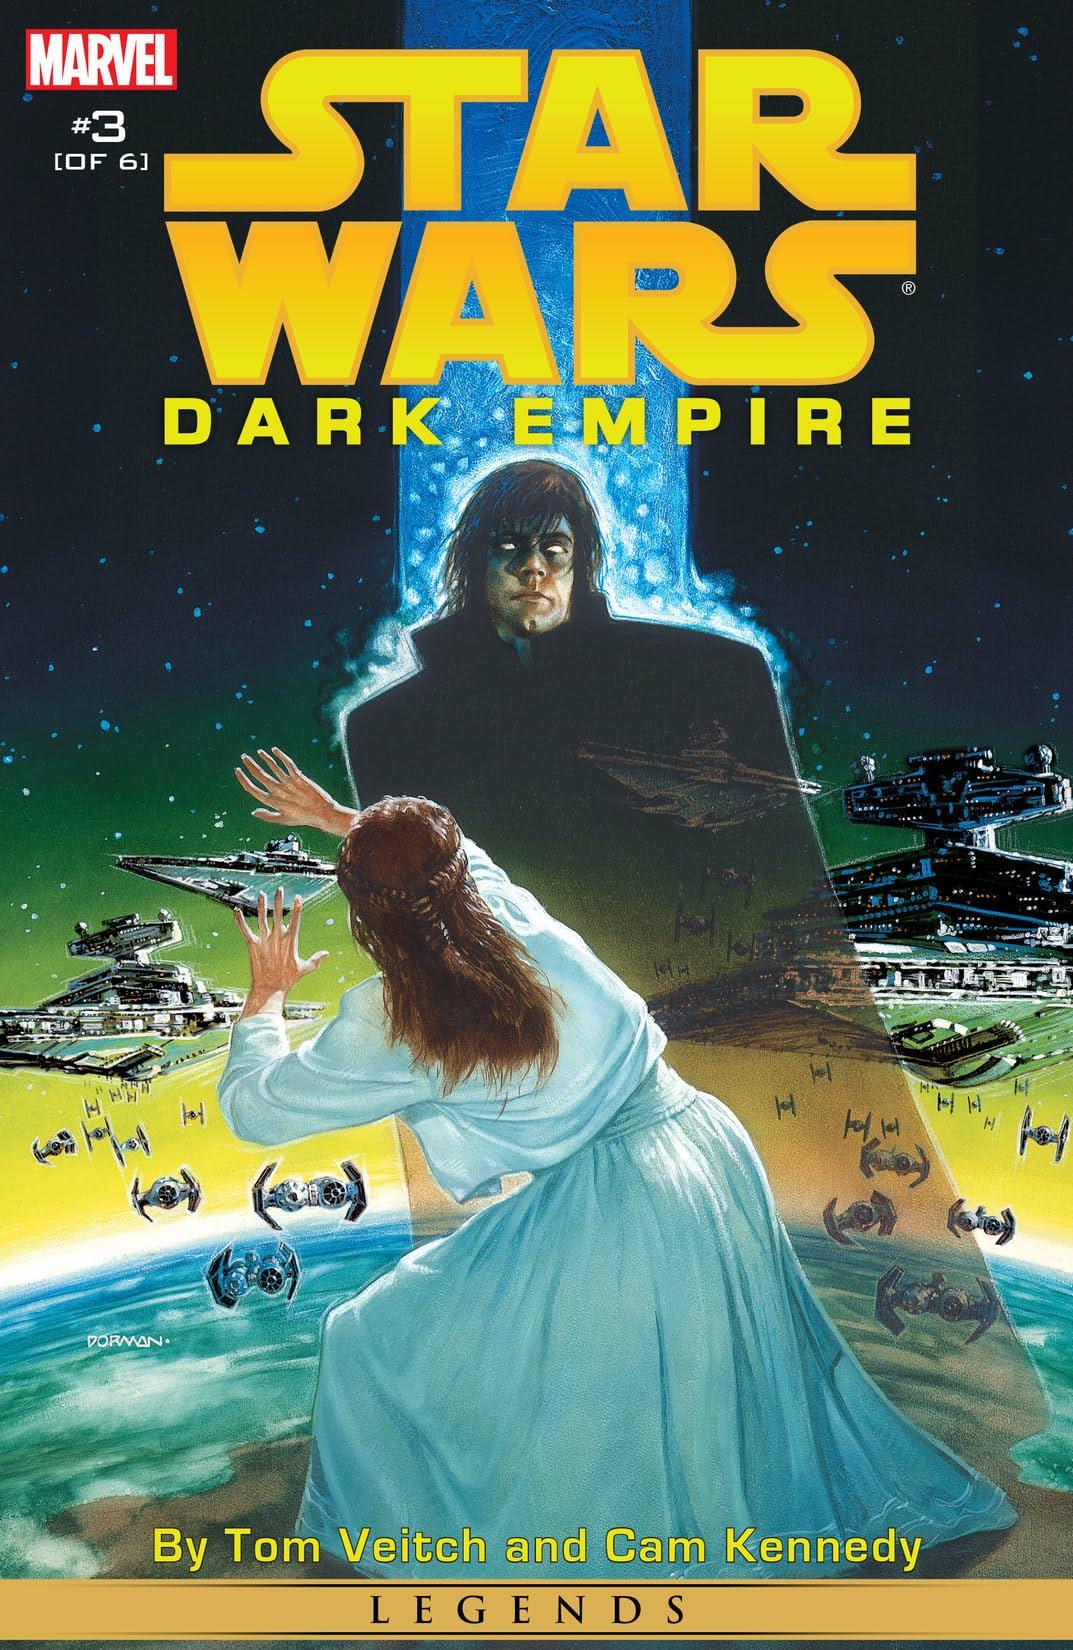 Star Wars: Dark Empire (1991) #3 (of 6)